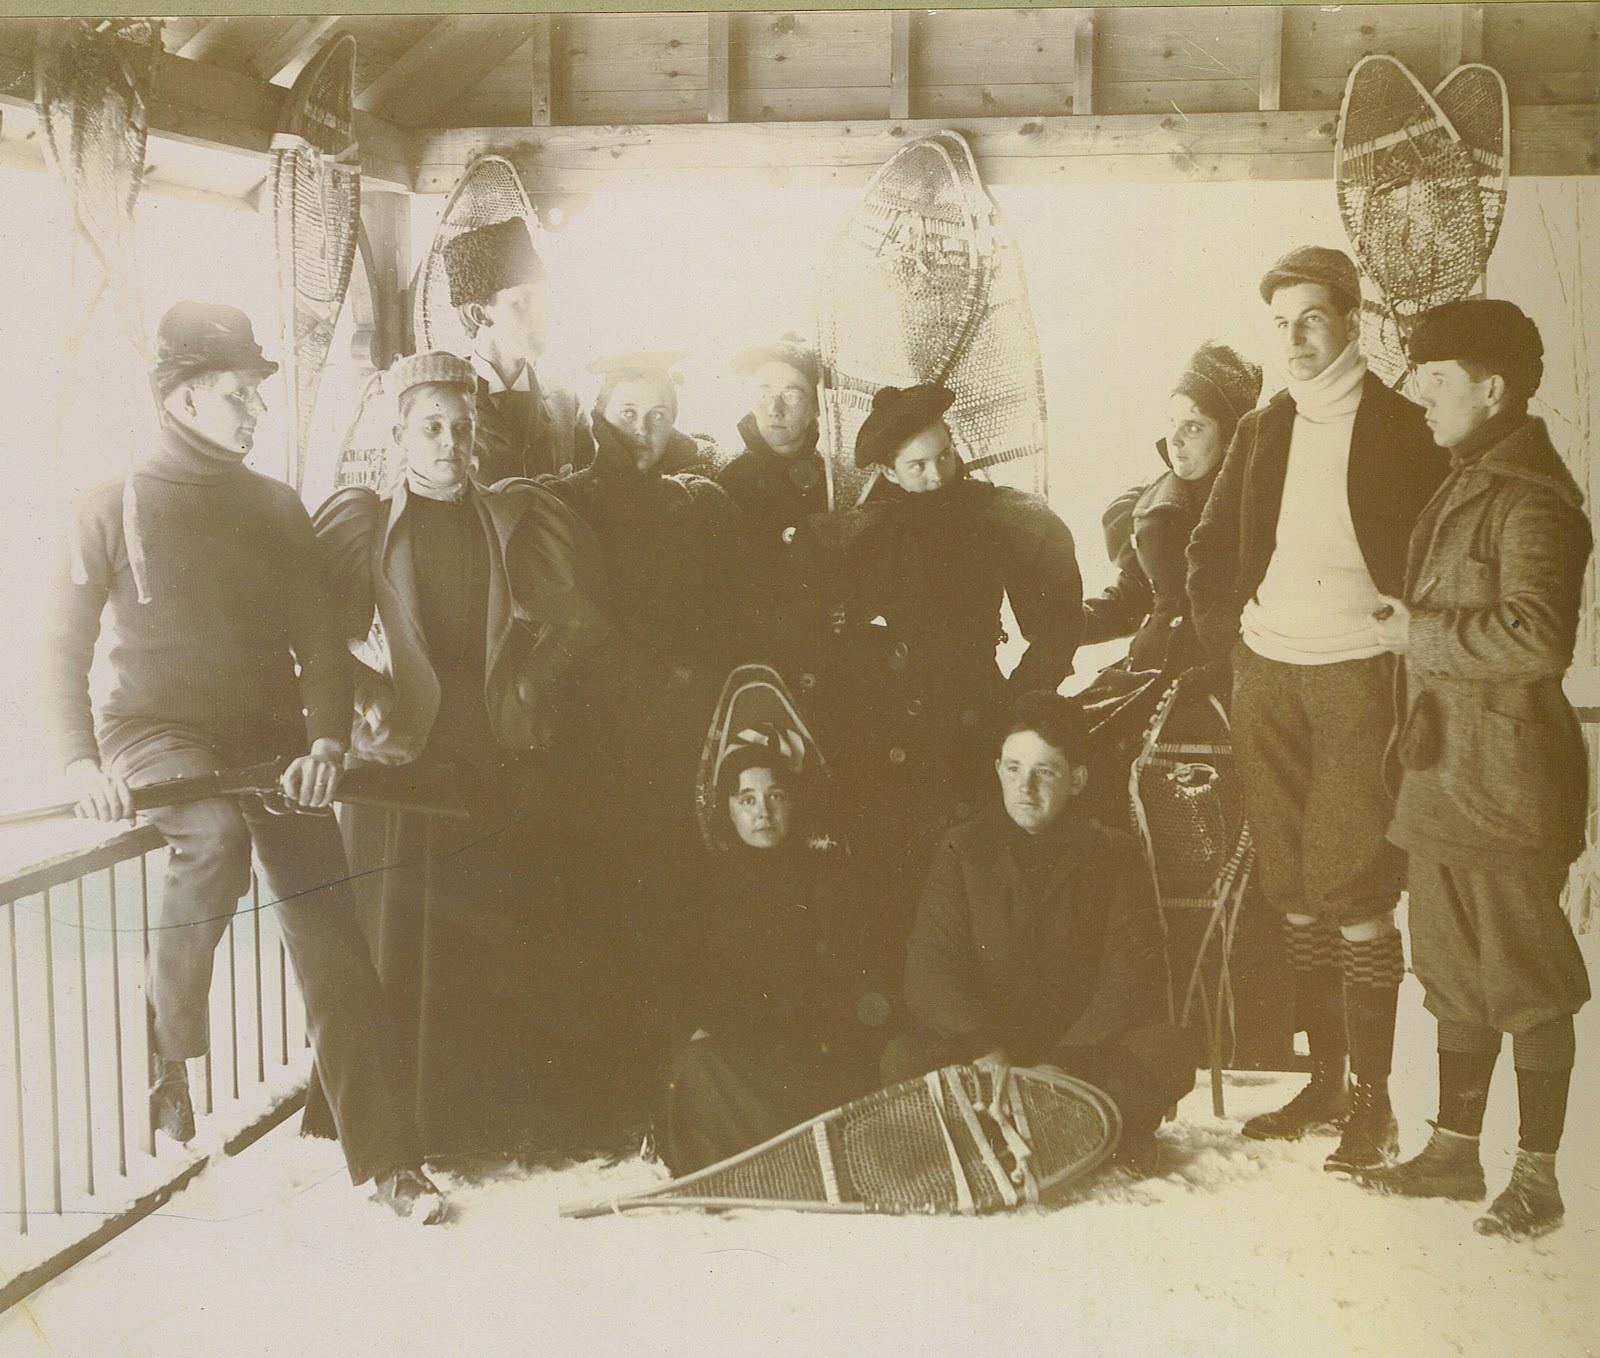 The Franklin County (NY) Historian: Winter Fun